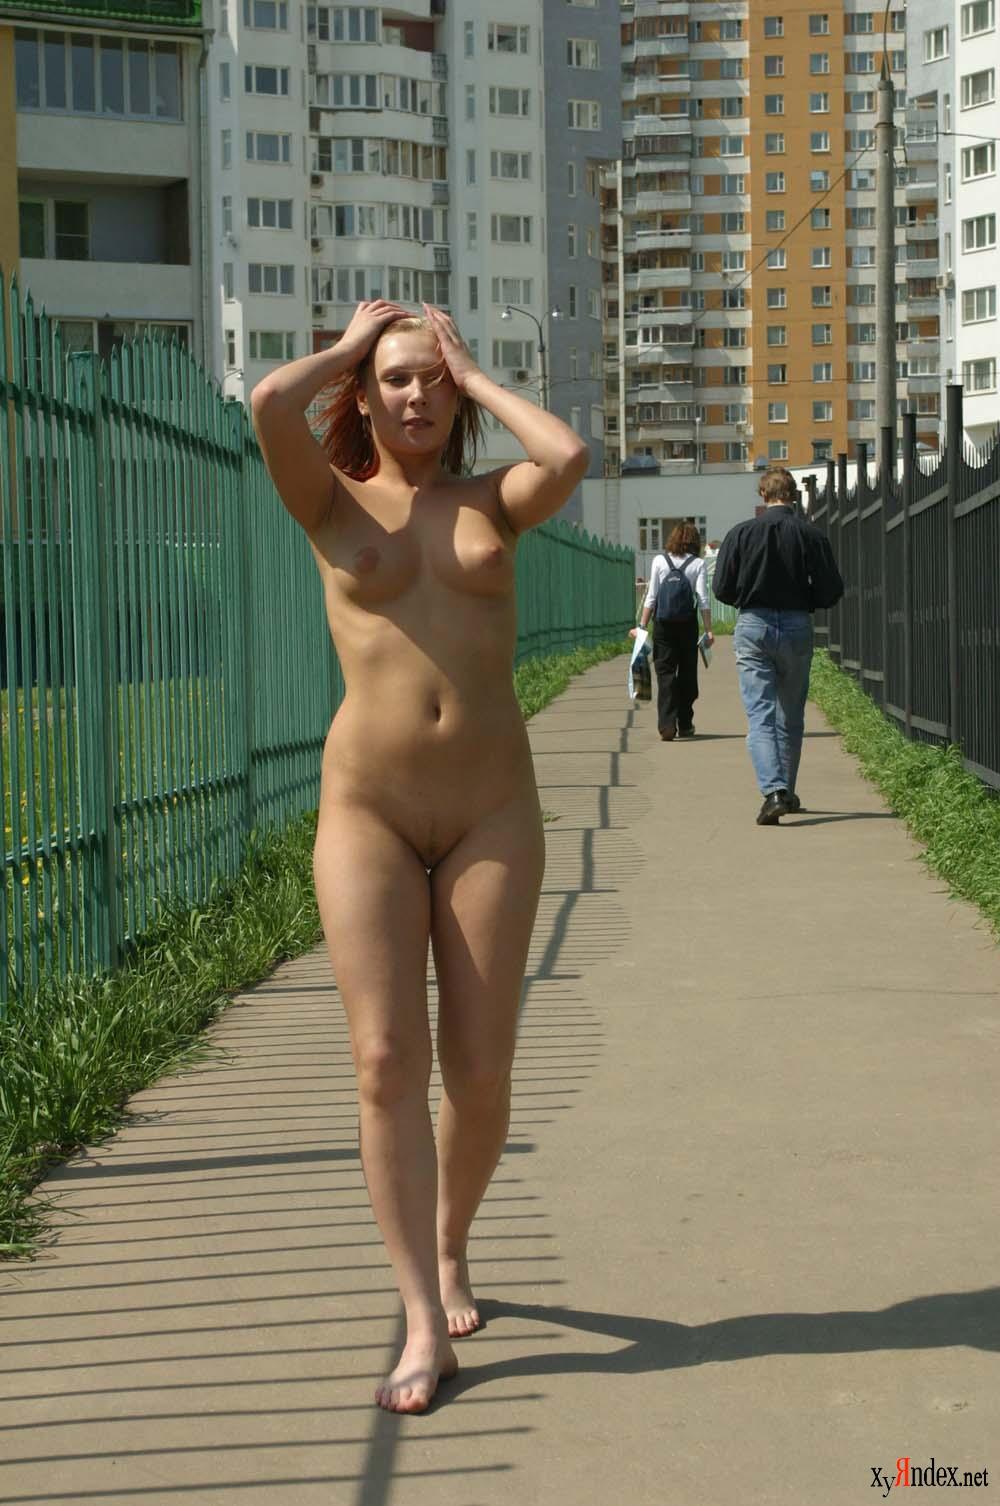 Зрелые без трусов на улице видео фото 581-773